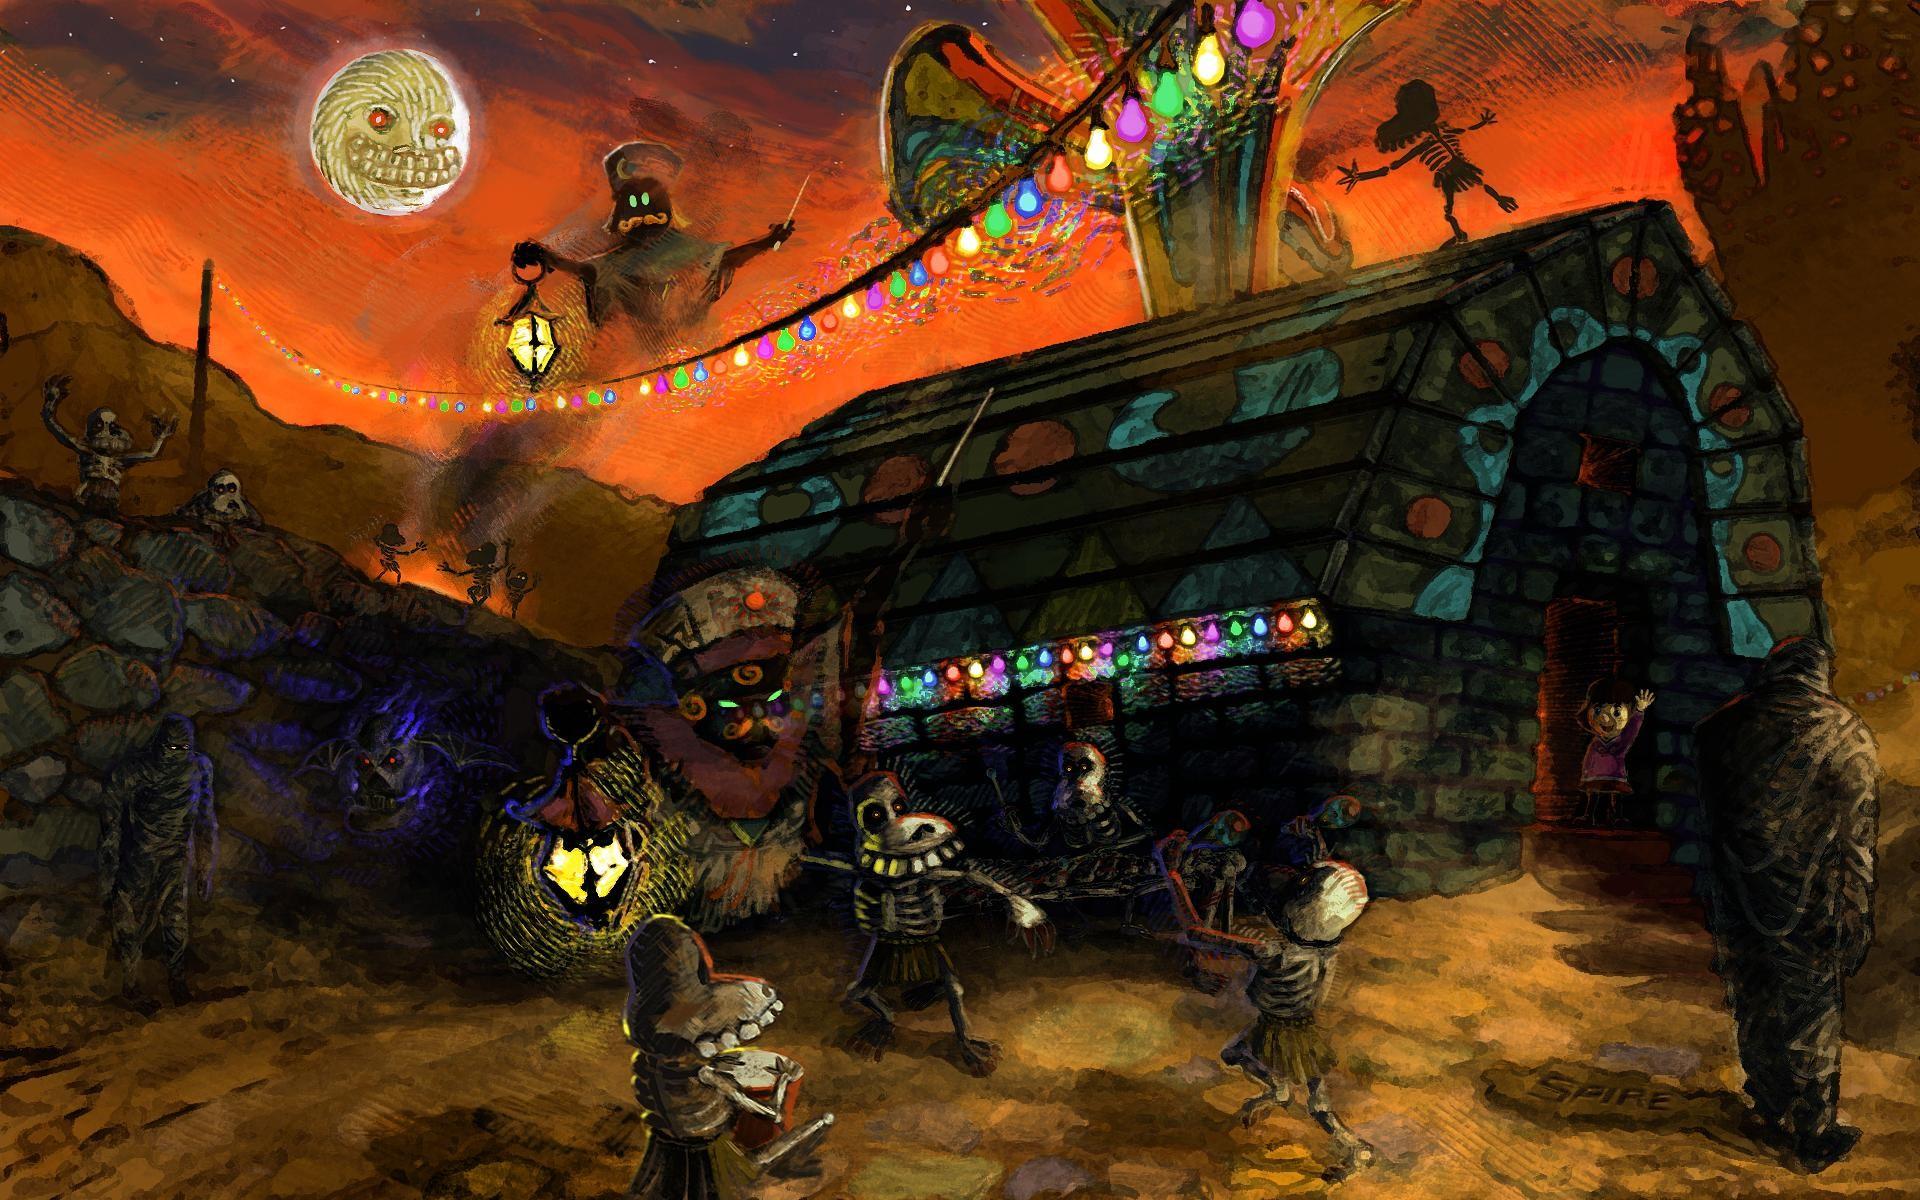 Nintendo video games cityscapes zombies Moon houses DeviantART ...